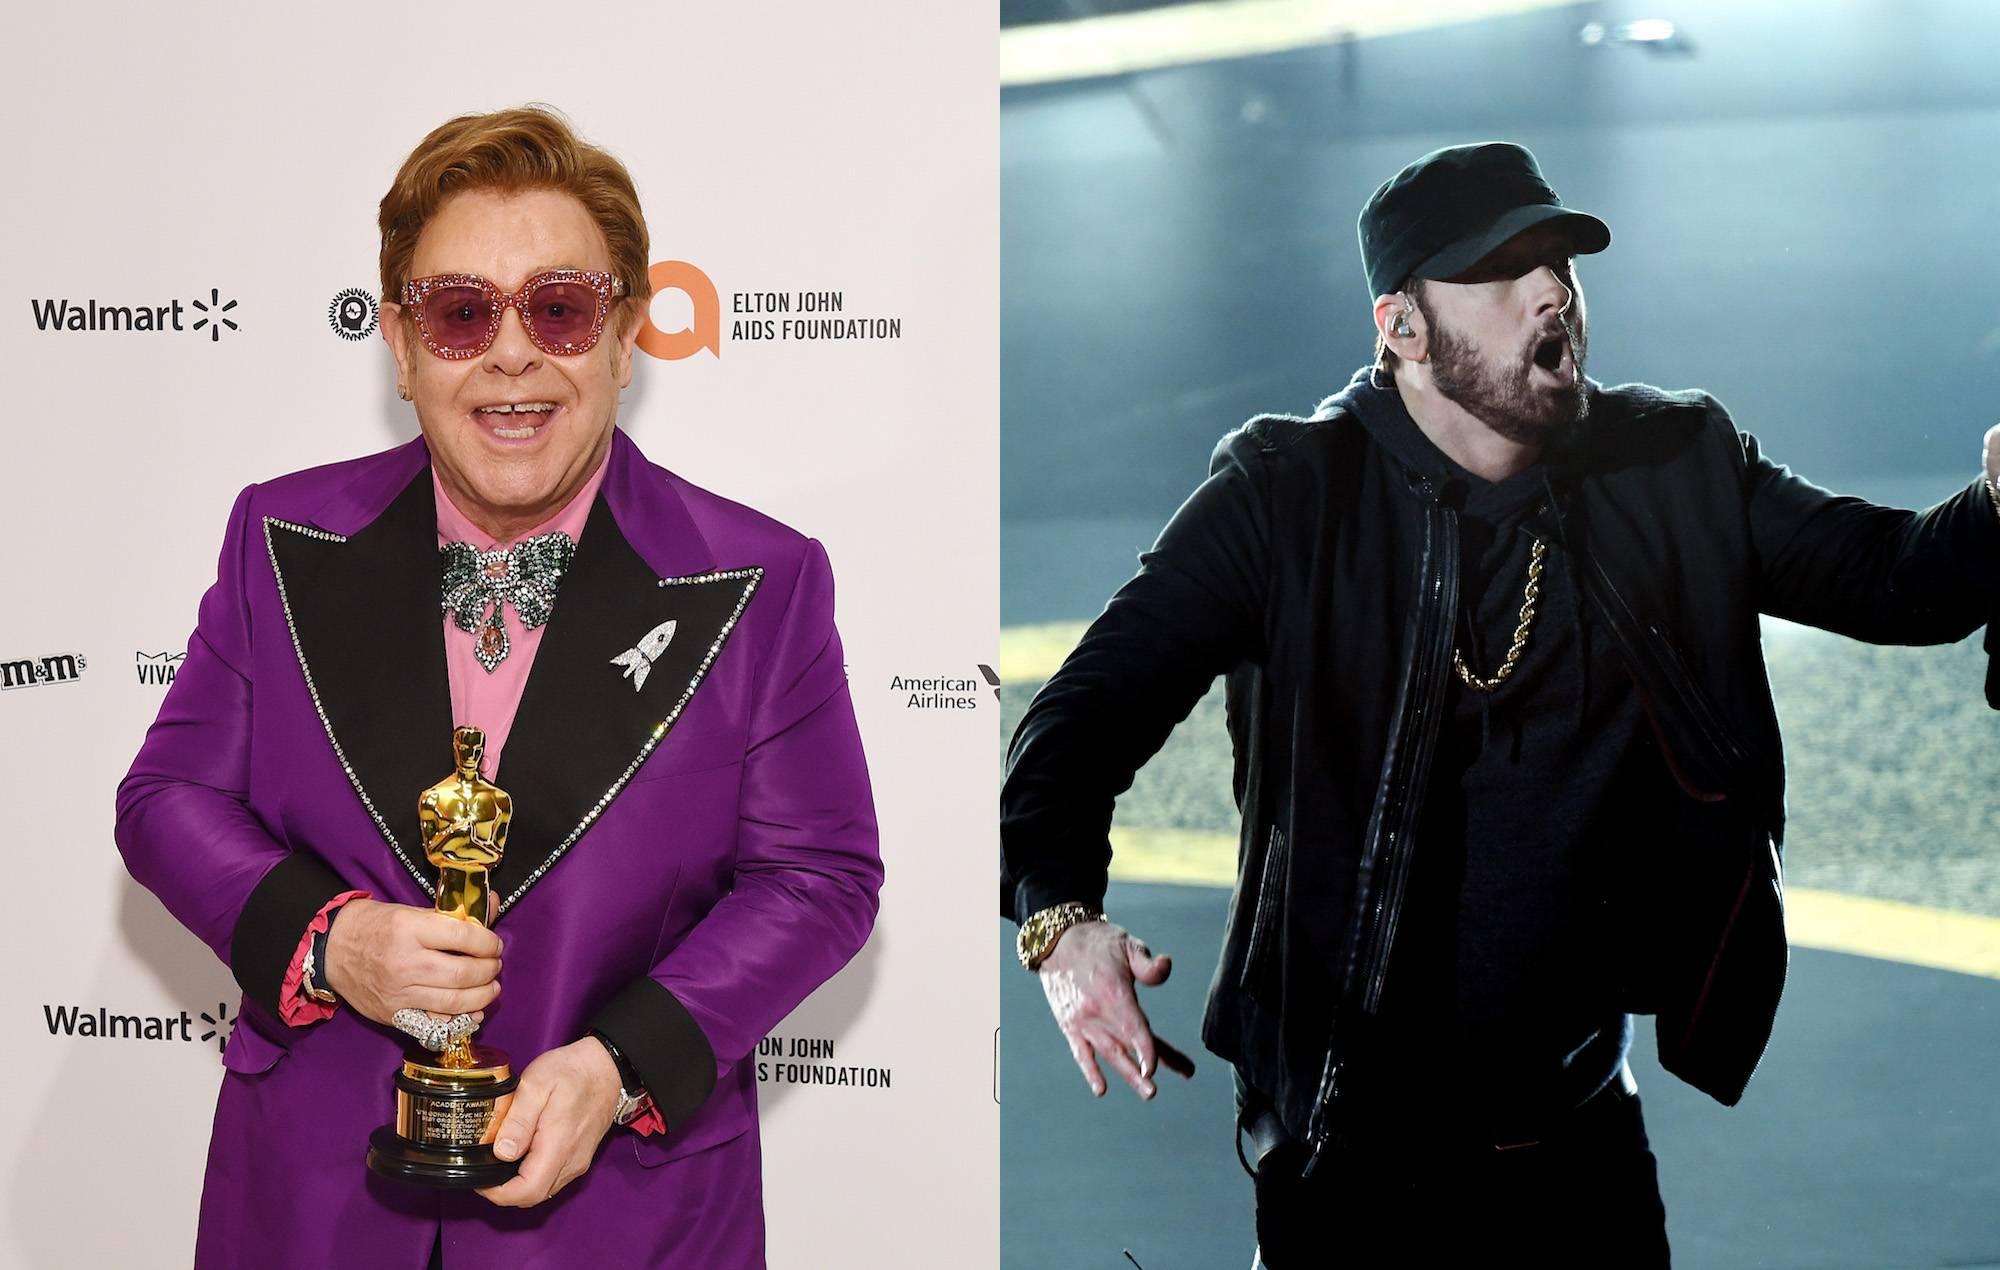 Eminem Reunites With Uncle Elton John At The Oscars